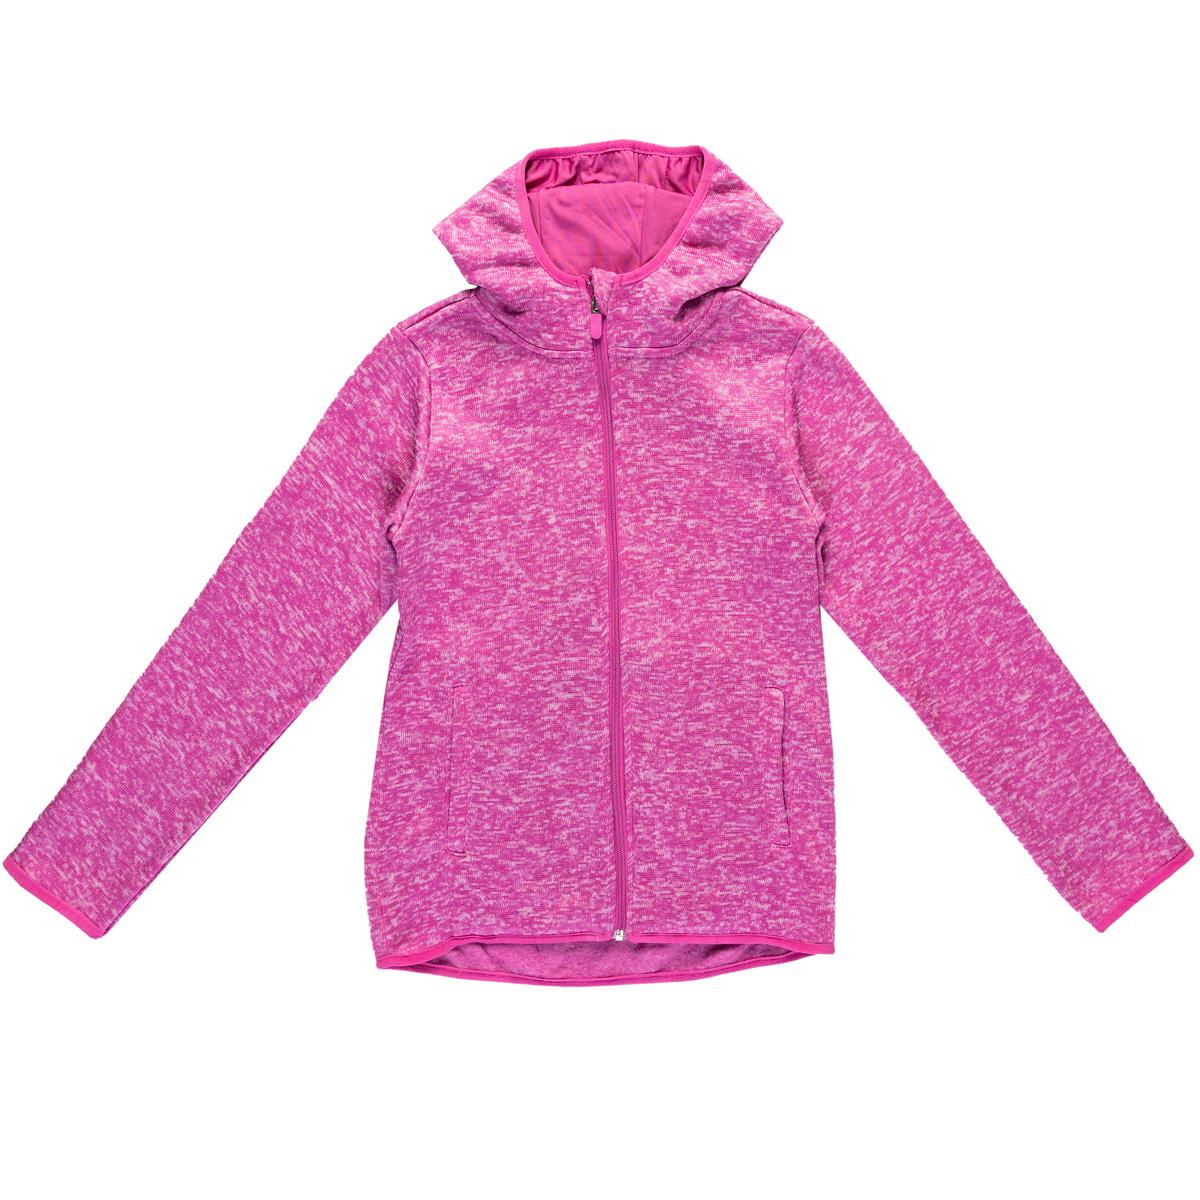 Dekliška jakna, temno roza